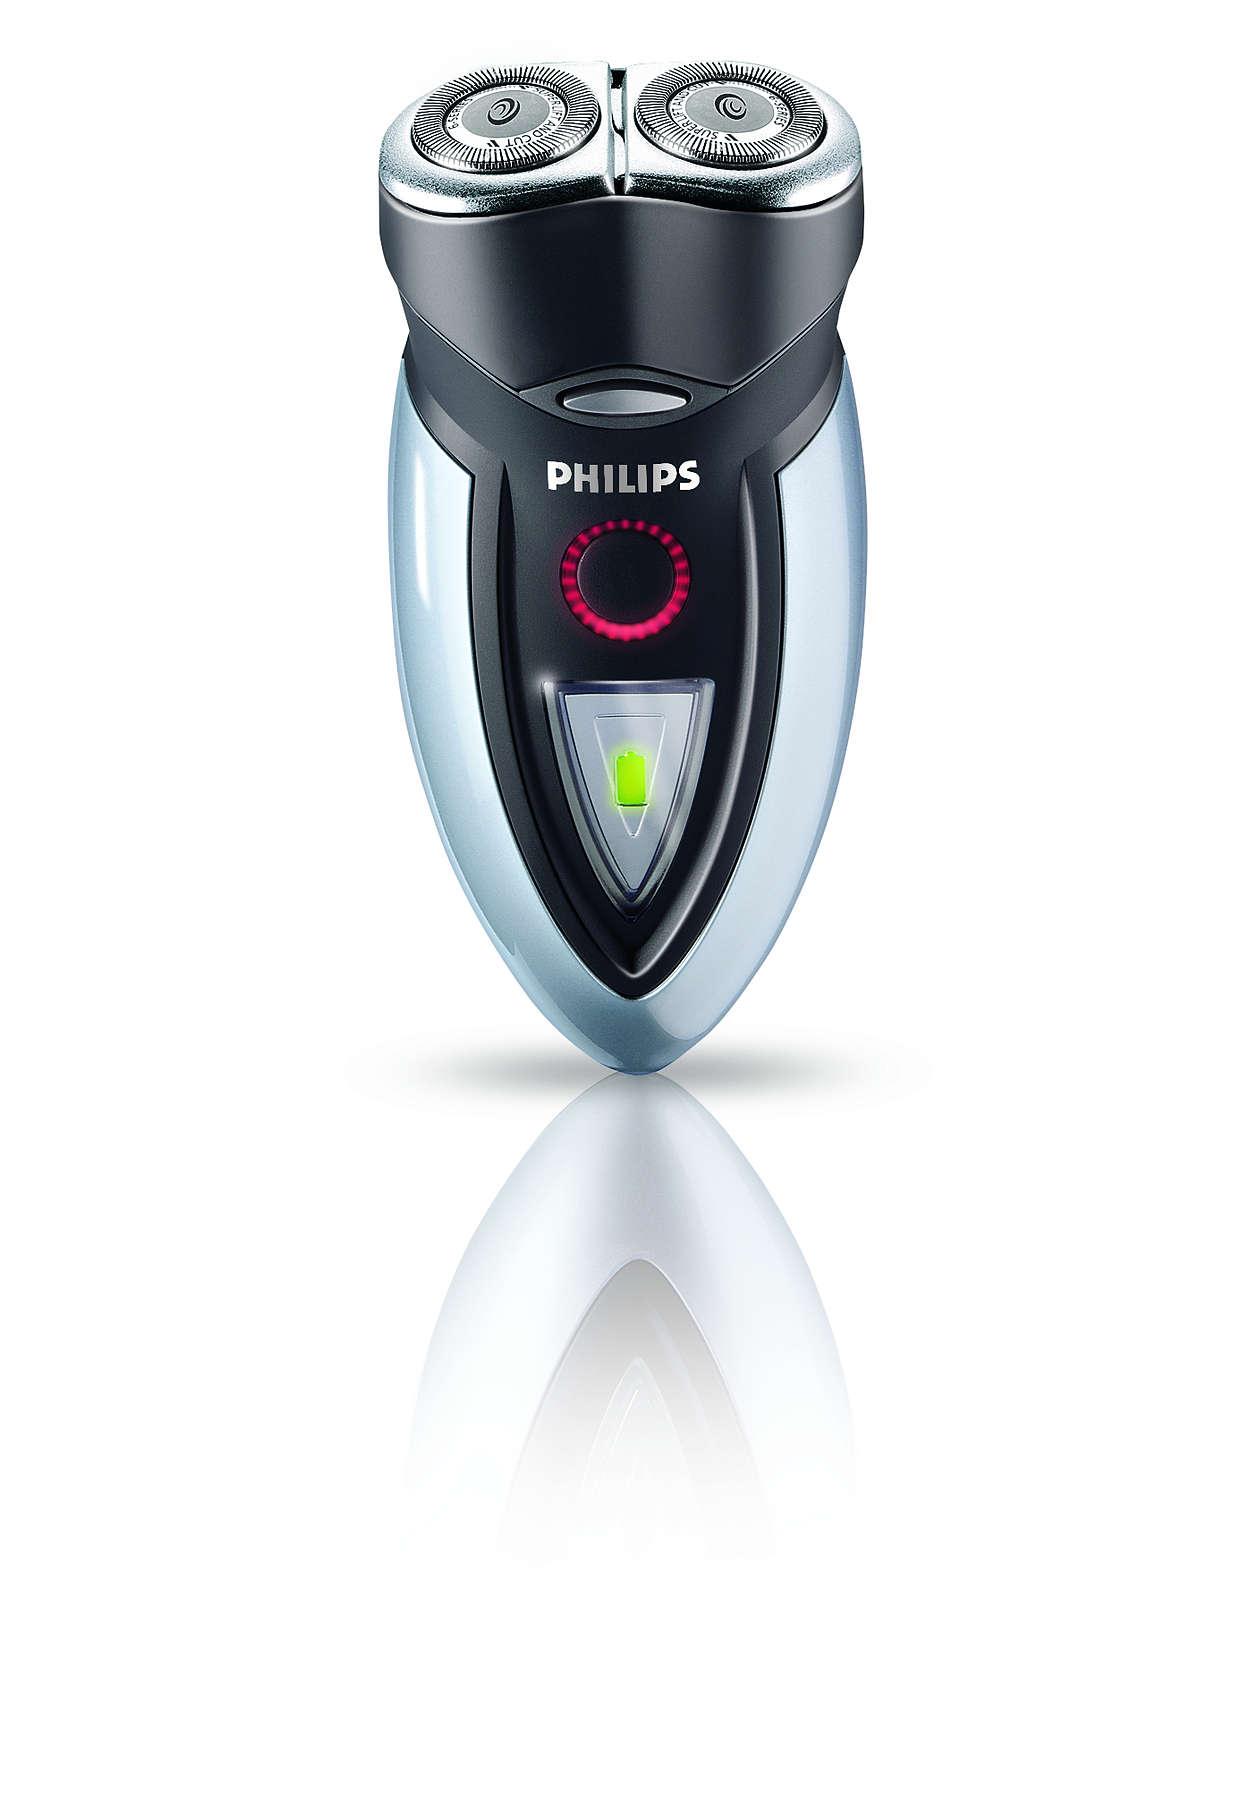 Un afeitado más apurado